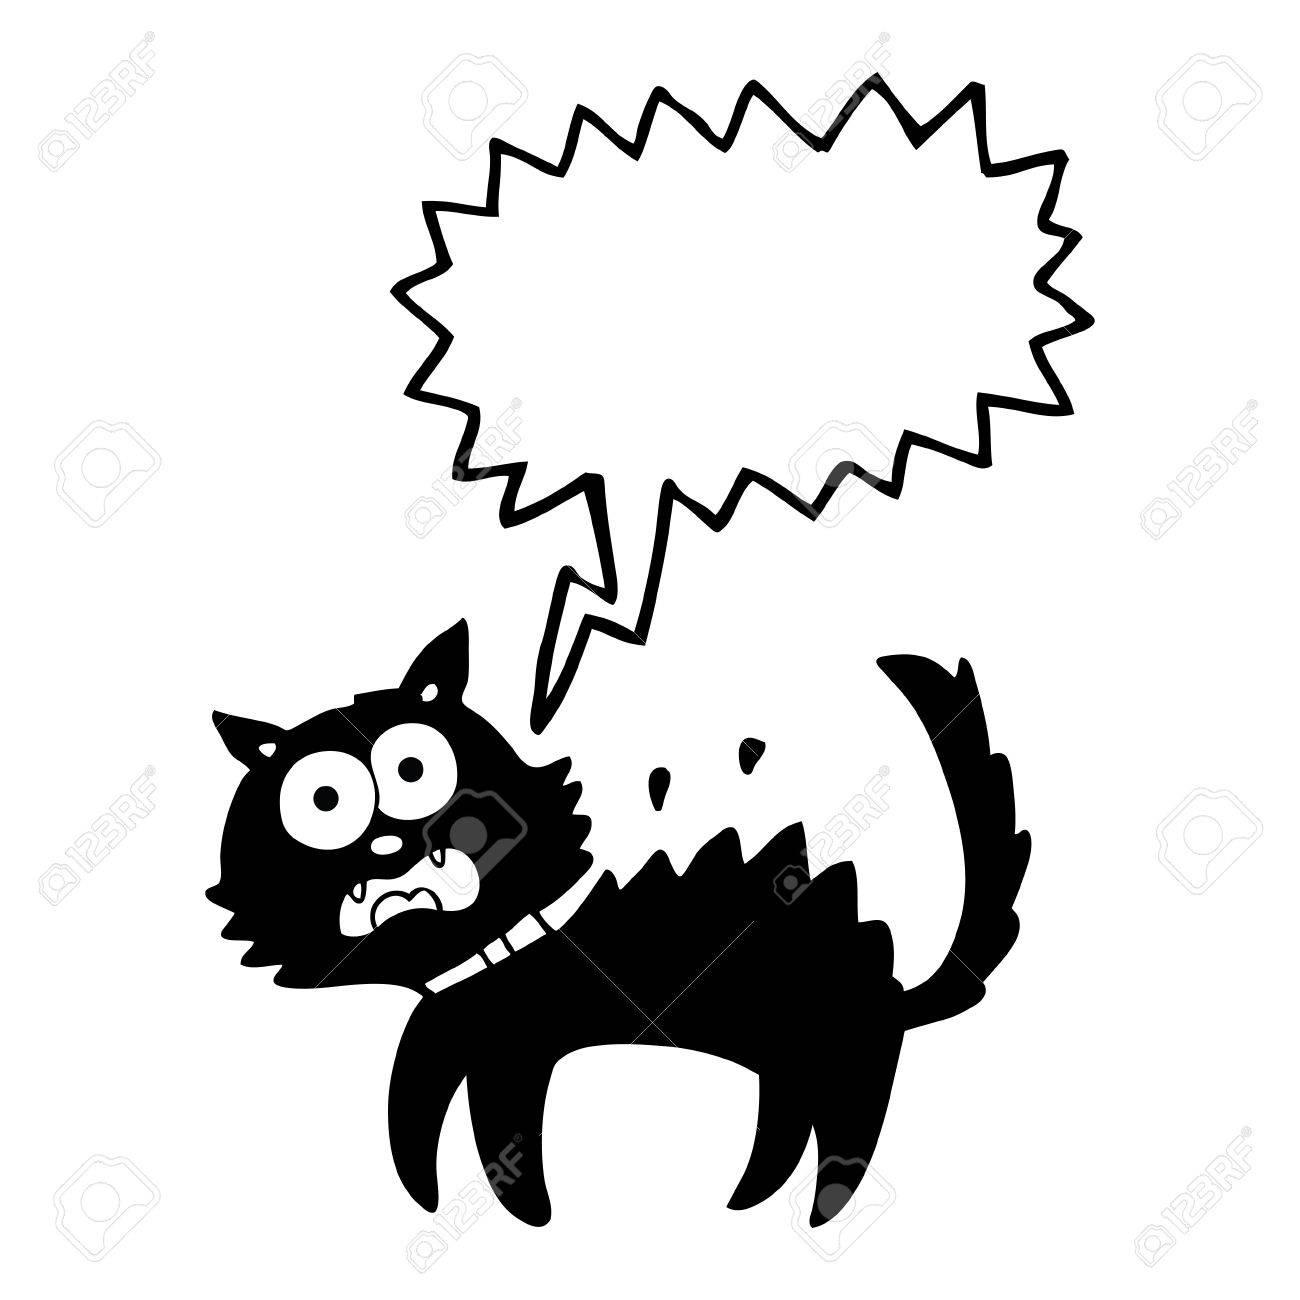 1300x1300 Freehand Drawn Speech Bubble Cartoon Scared Black Cat Royalty Free